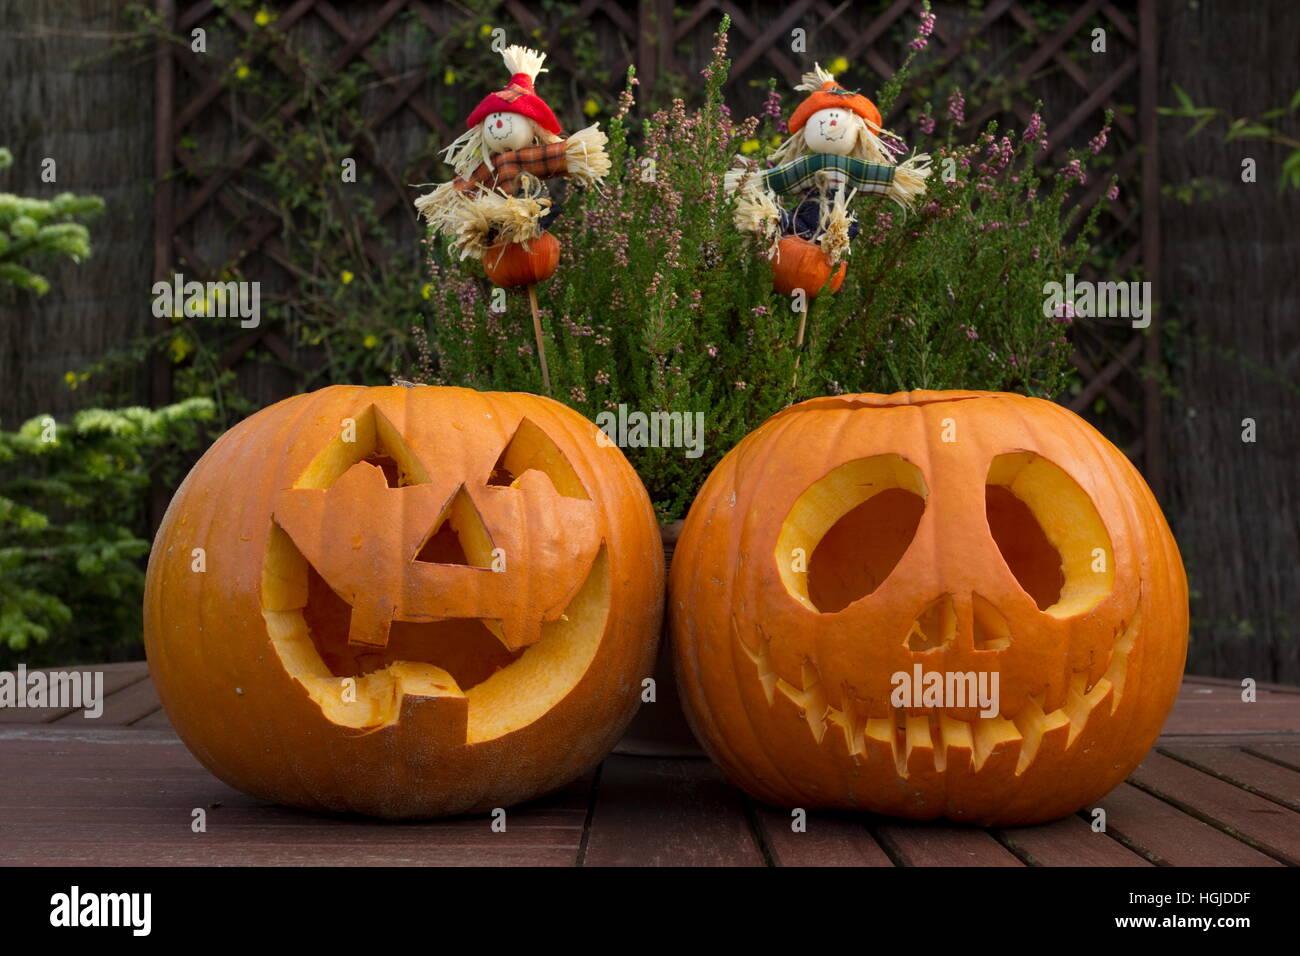 Facce Zucche Di Halloween.Scolpite Facce Di Zucca Di Halloween Foto Immagine Stock